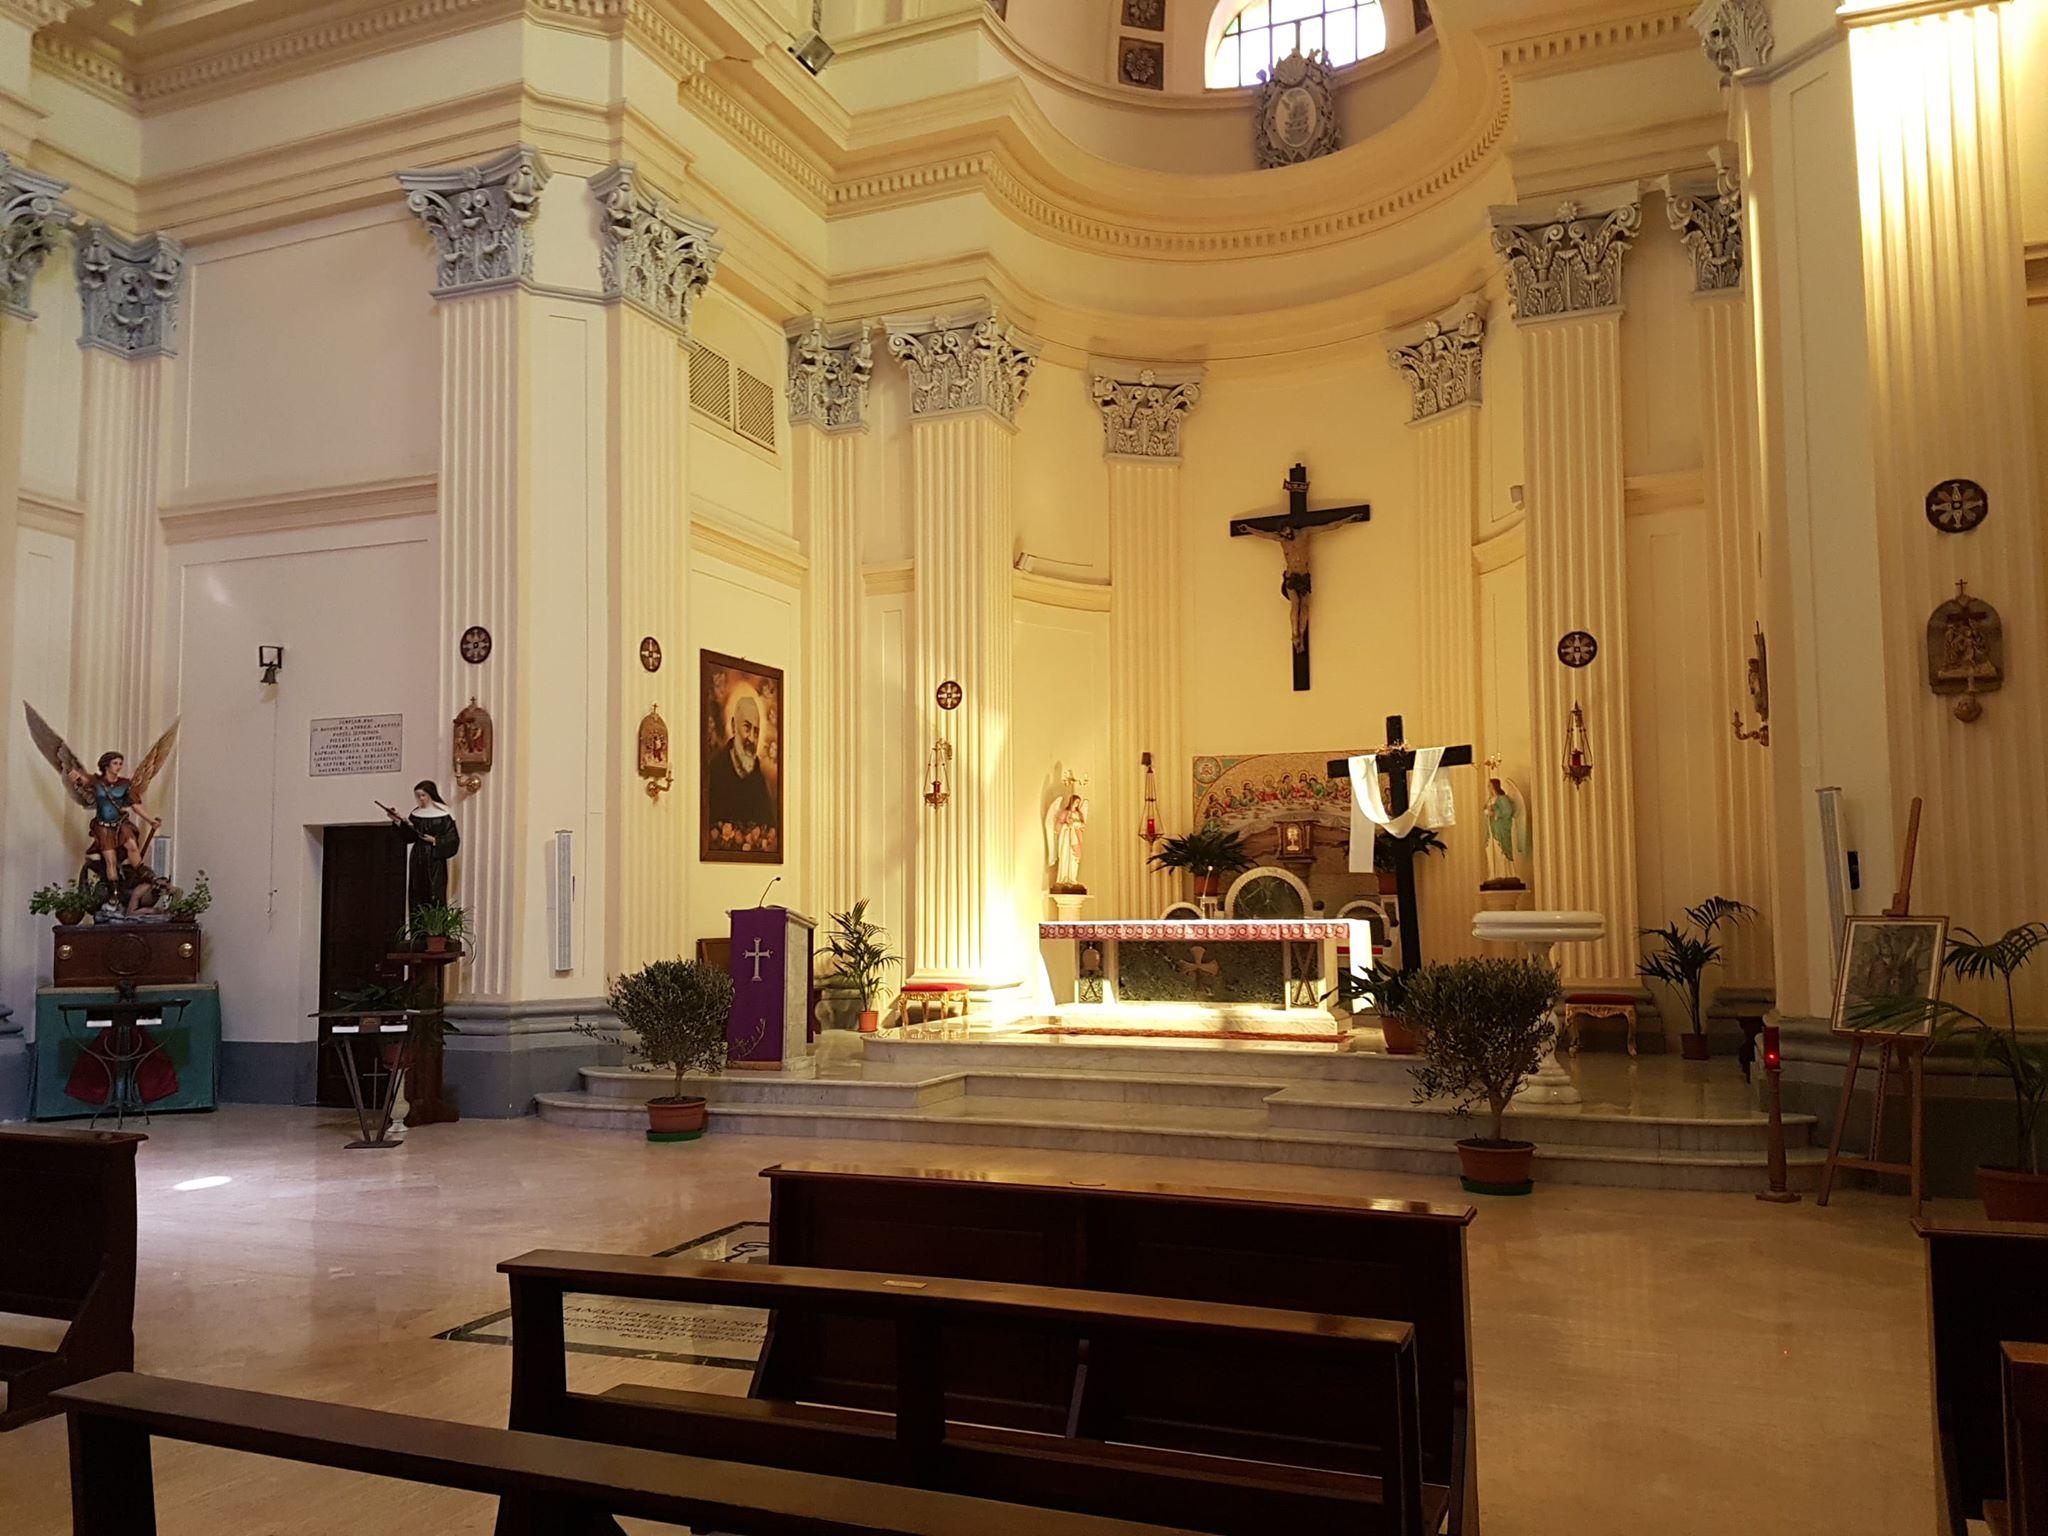 Interno Chiesa S Andrea 3 Confinelive Confinelive